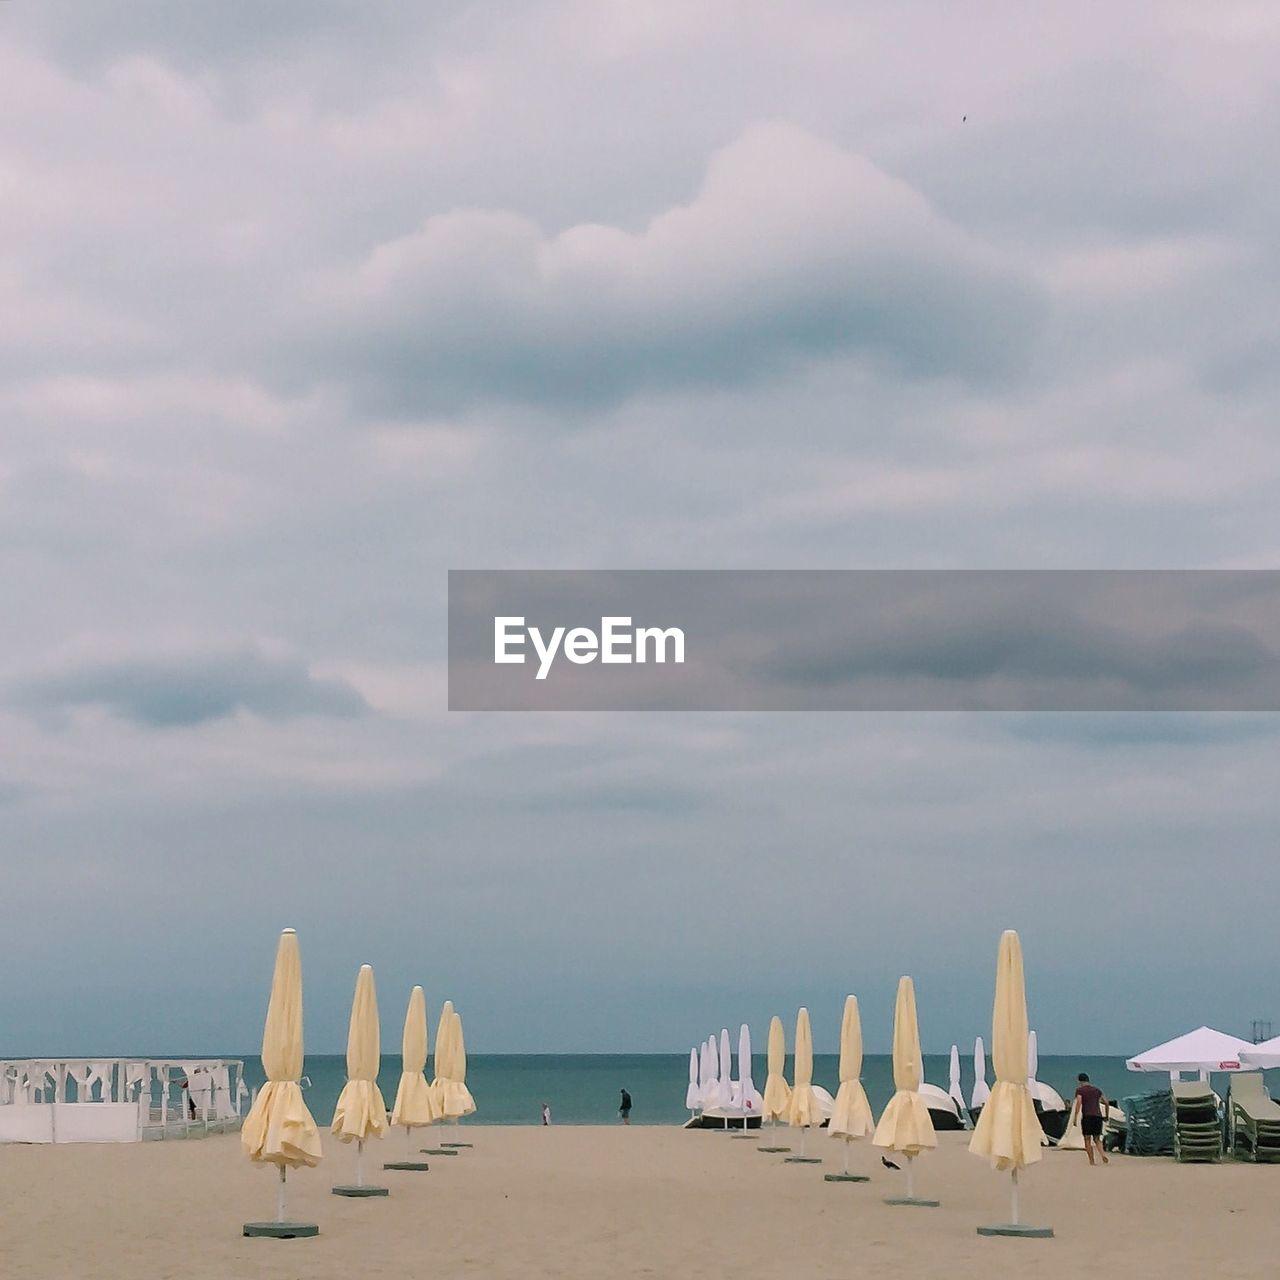 Closed beach umbrellas on beach